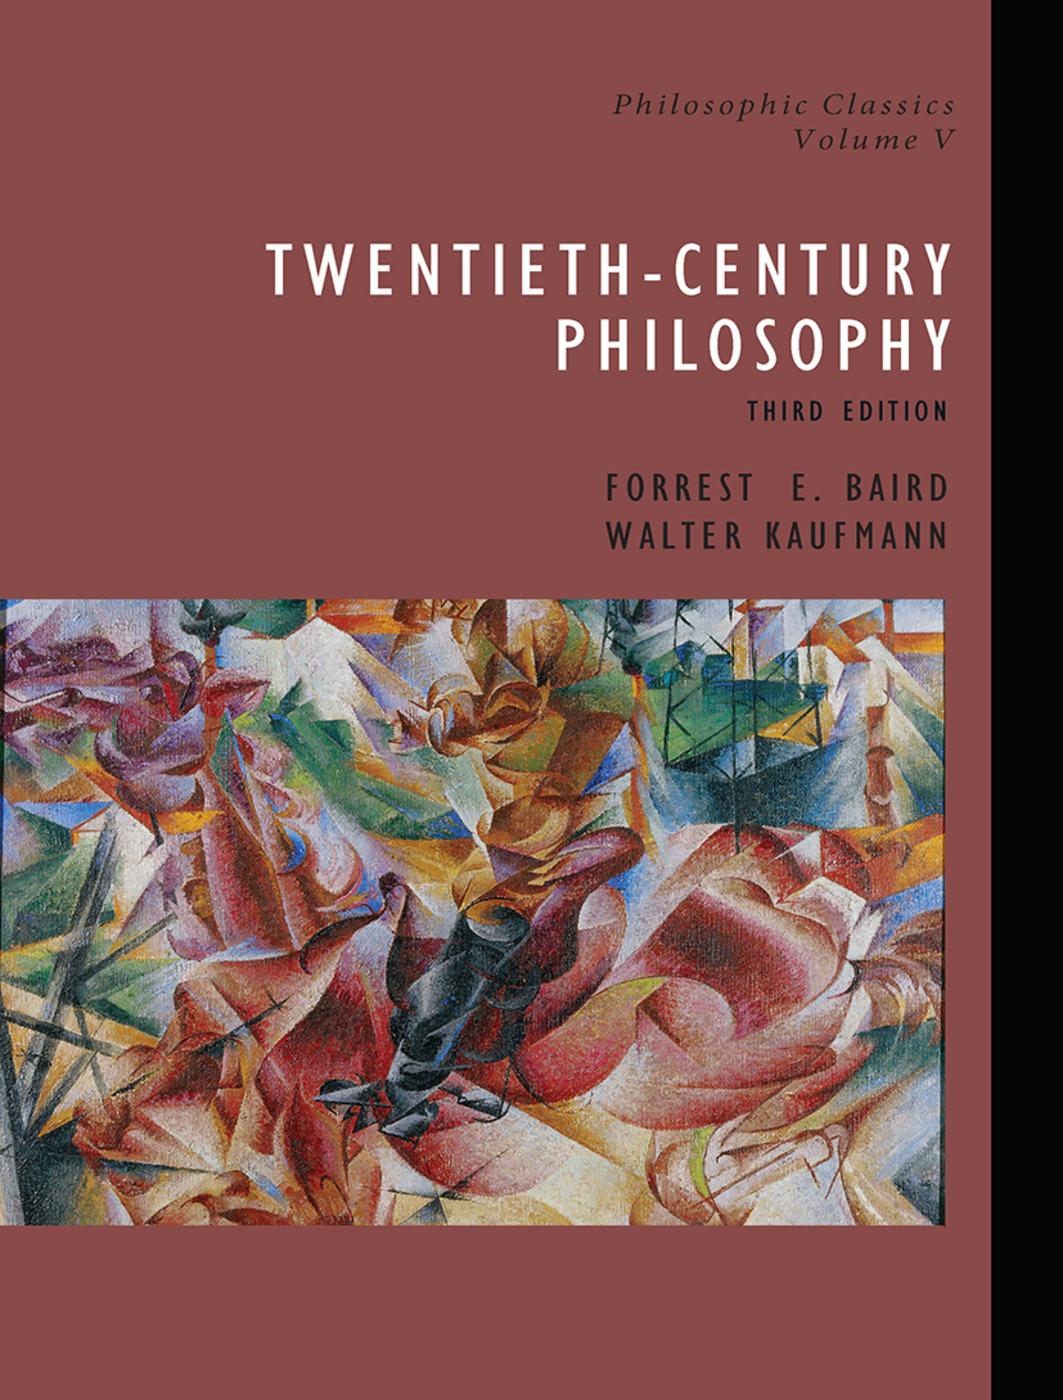 Philosophic Classics, Volume V: 20th-Century Philosophy, 3rd Edition (Paperback) book cover